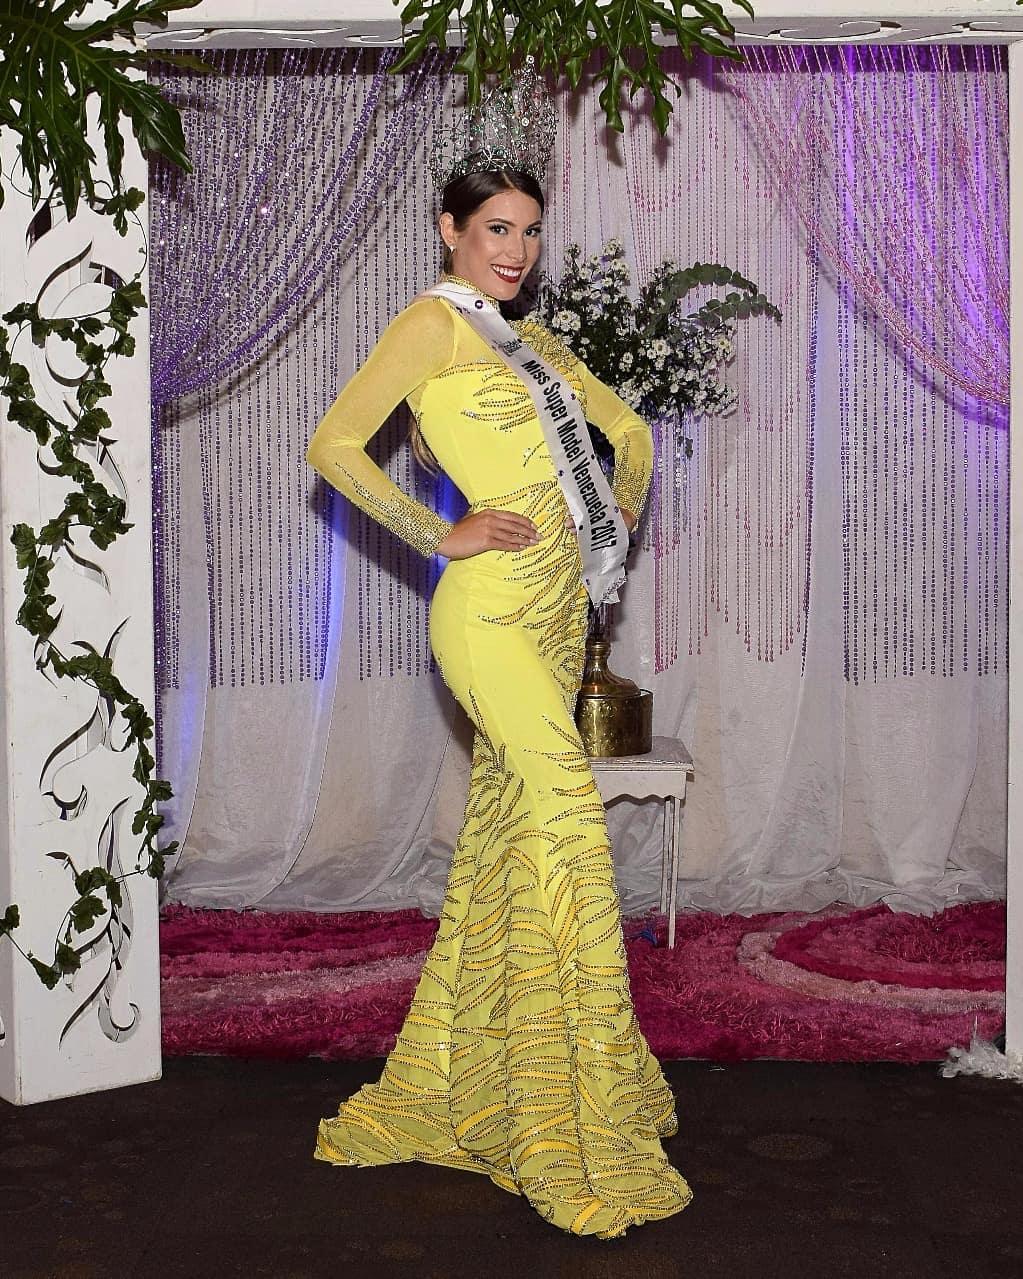 nicole ustariz, supermodel international venezuela 2018. 31296211